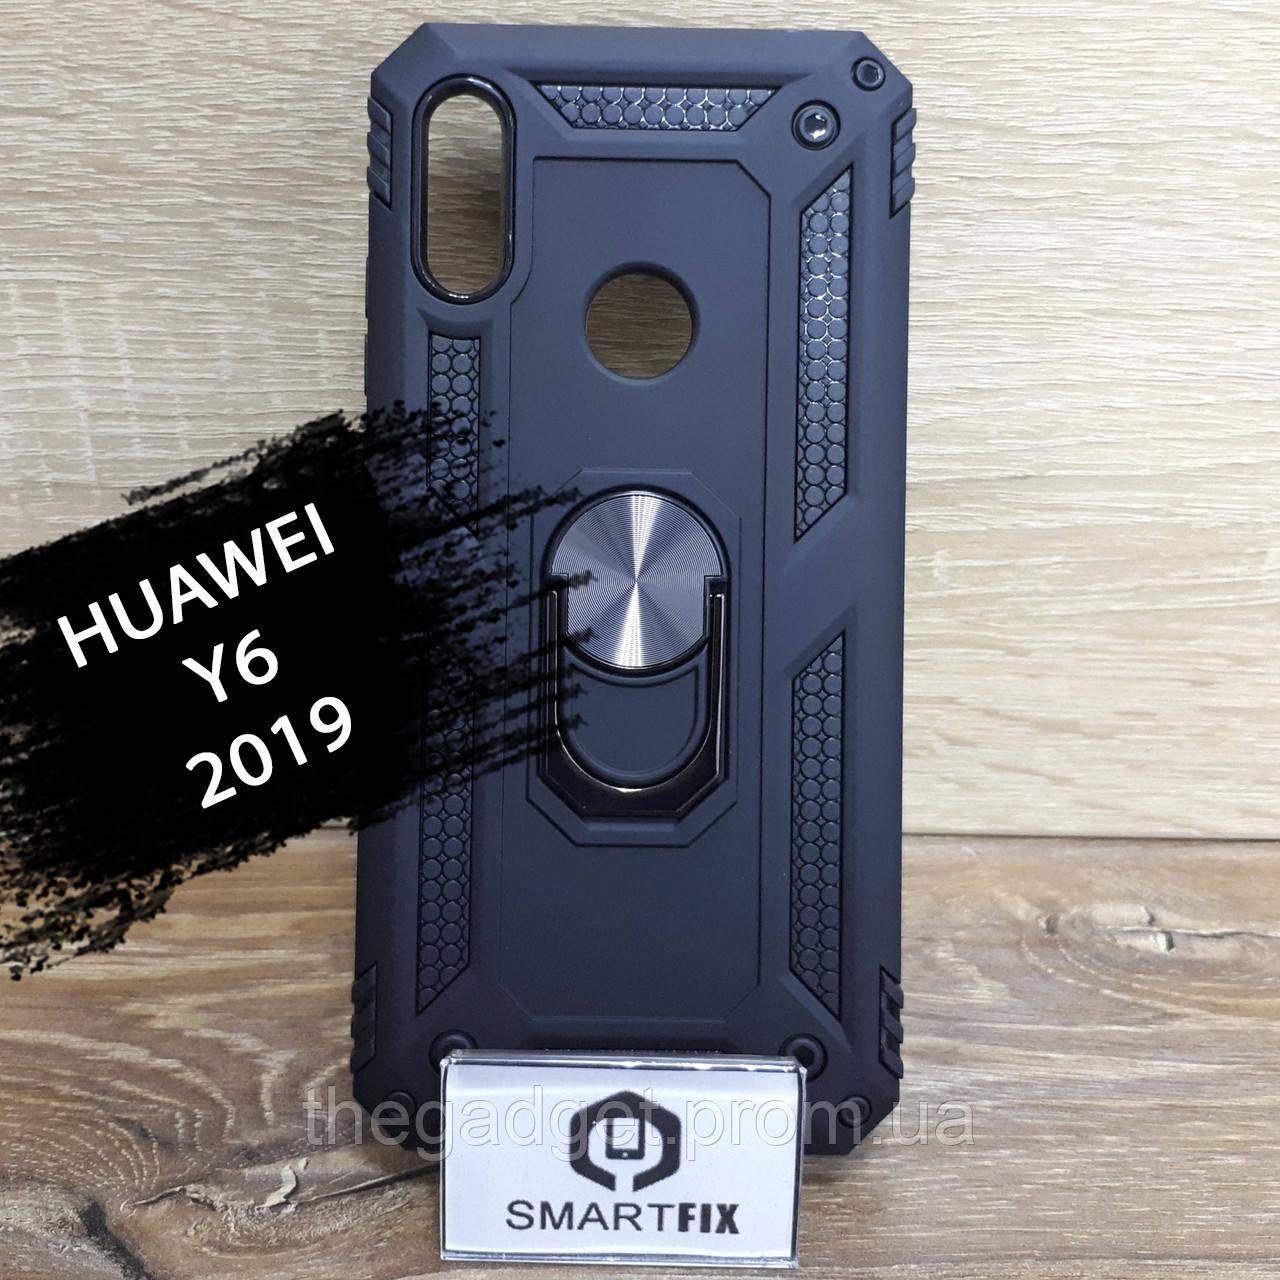 Противоударный чехол для Huawei Y6 2019 iPaky